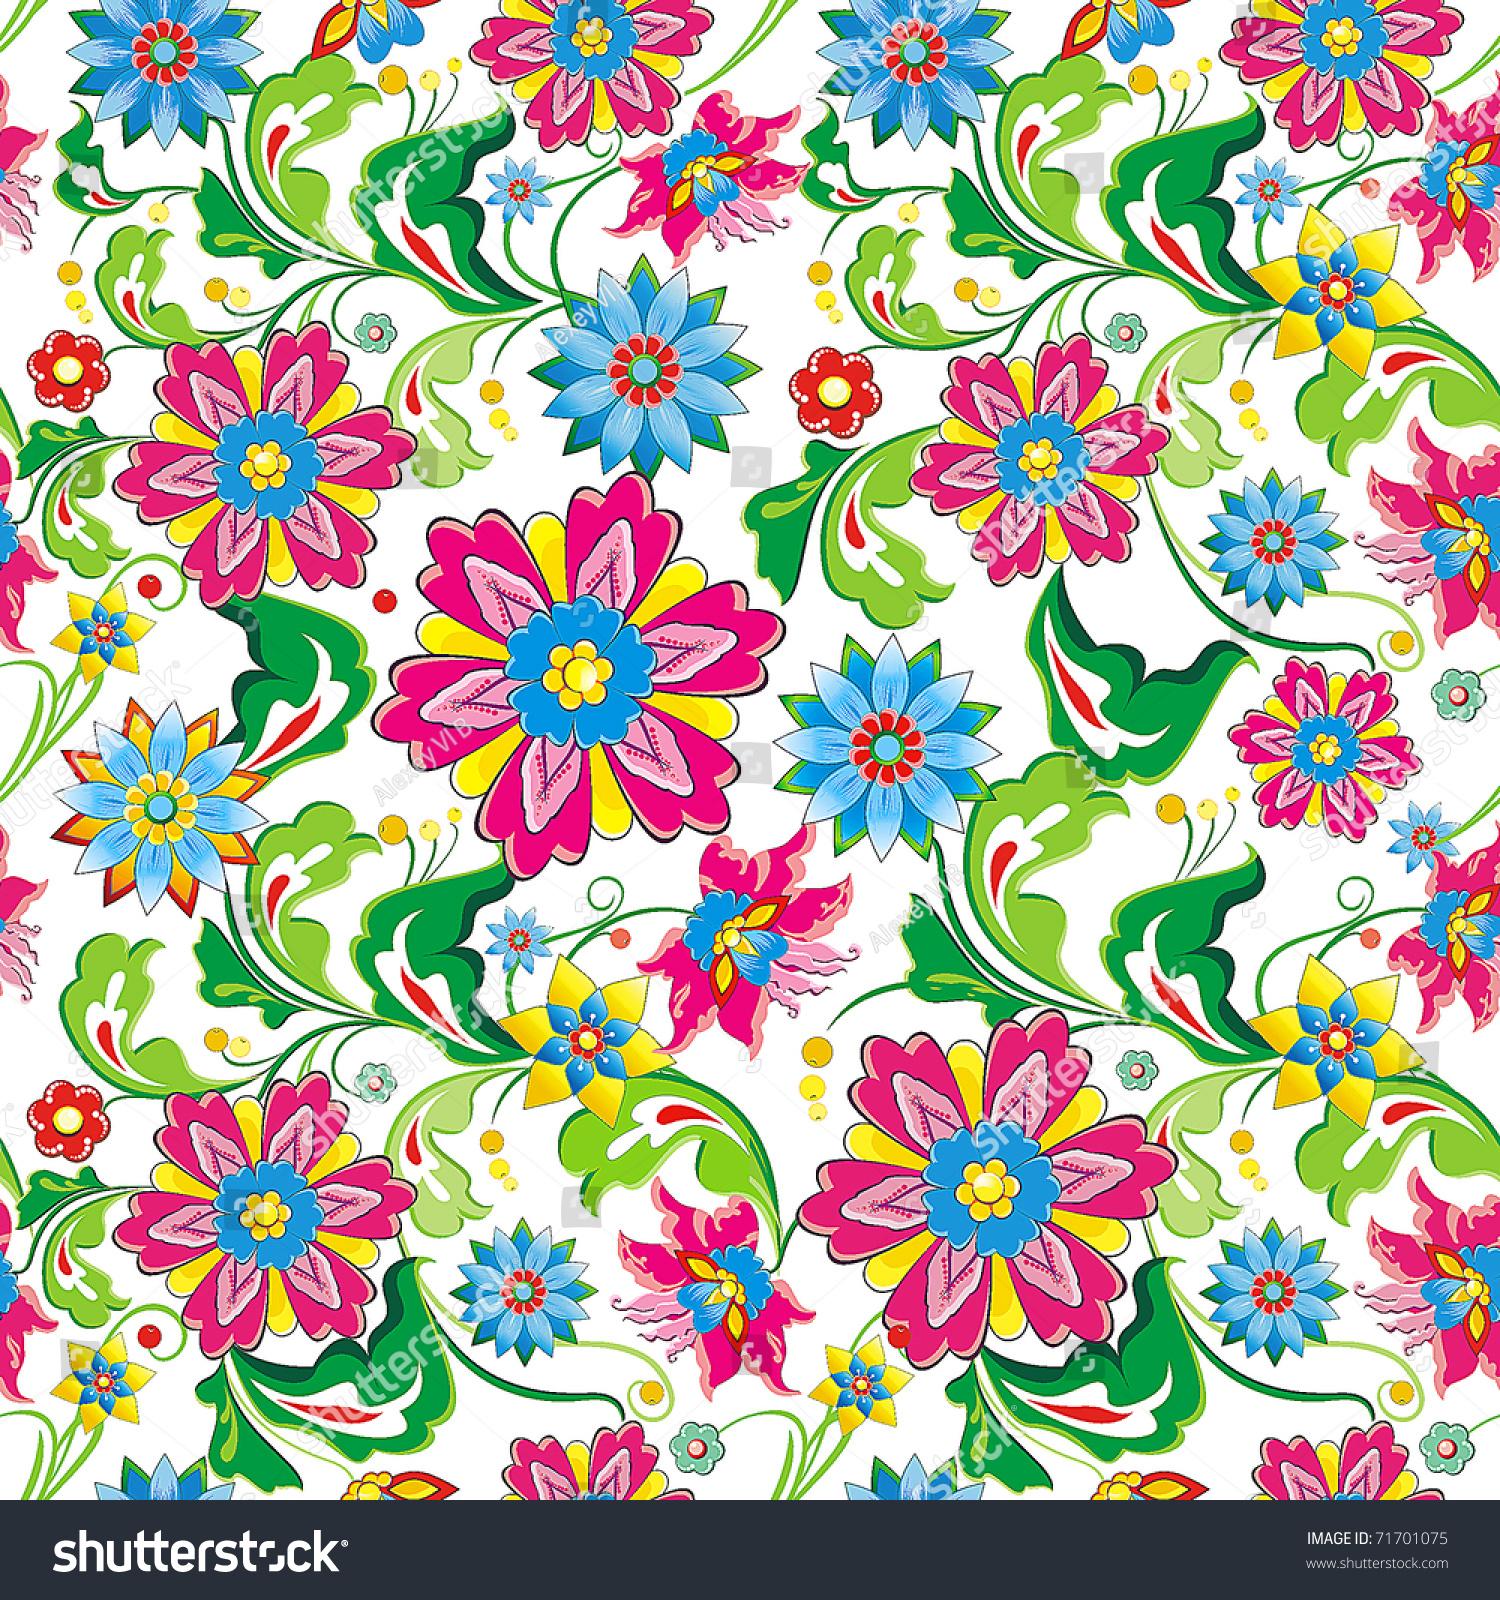 Vivid, Colorful, Repeating Seamless Floral Wallpaper